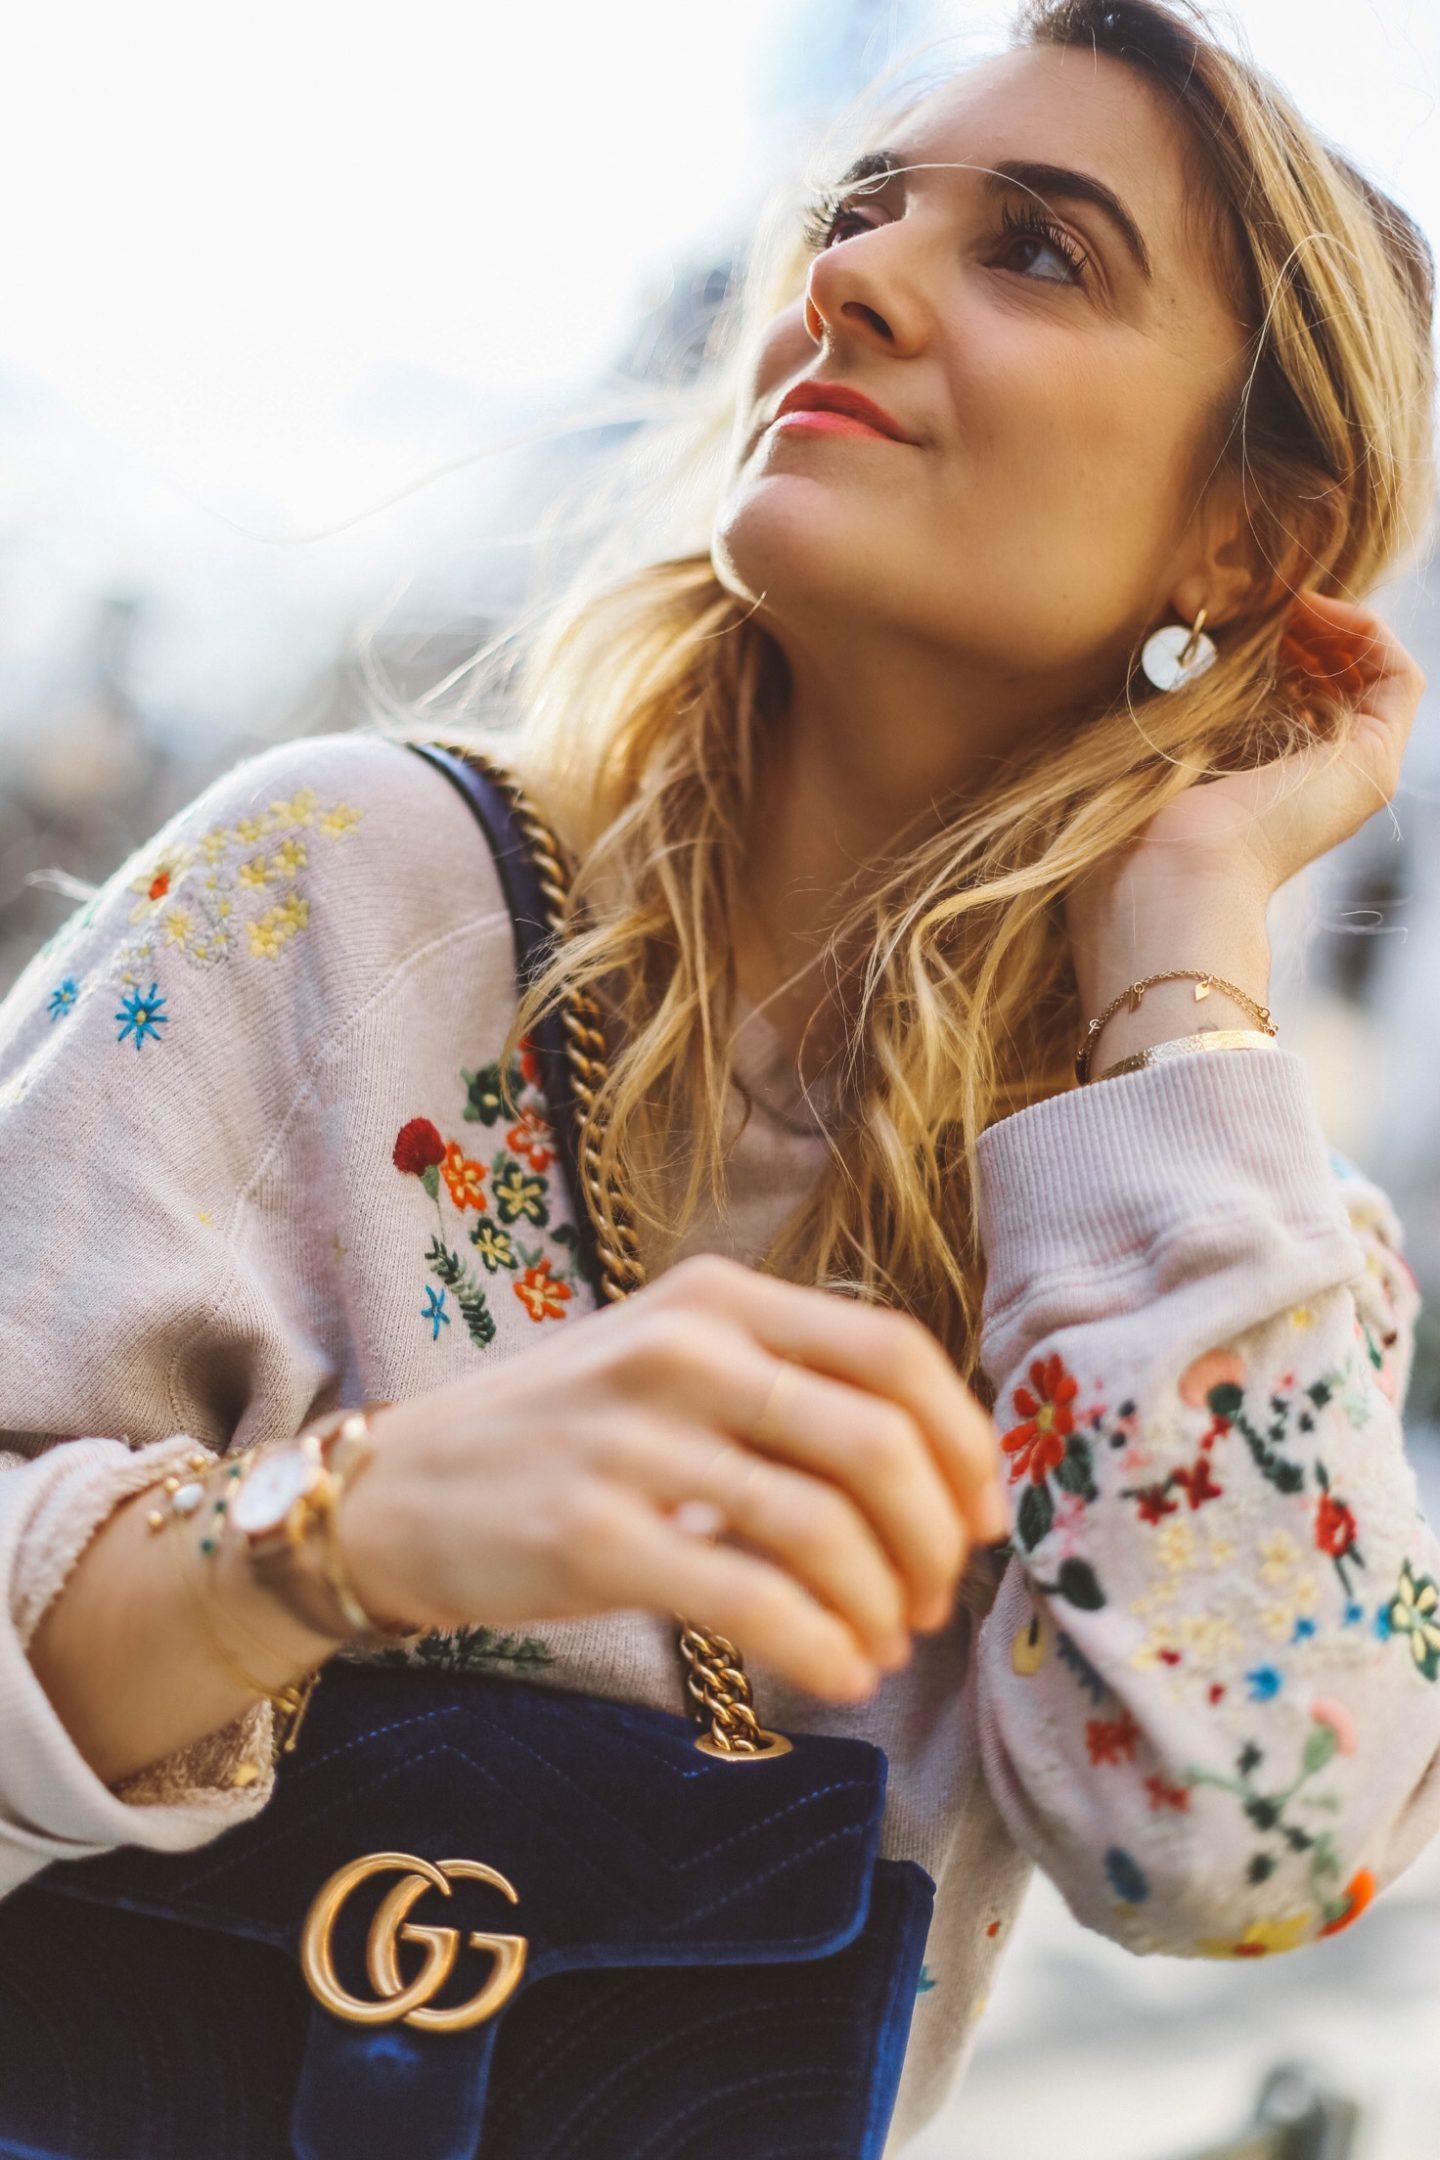 Boucle d'oreilles & Other Stories - Blondie Baby blog mode et voyages